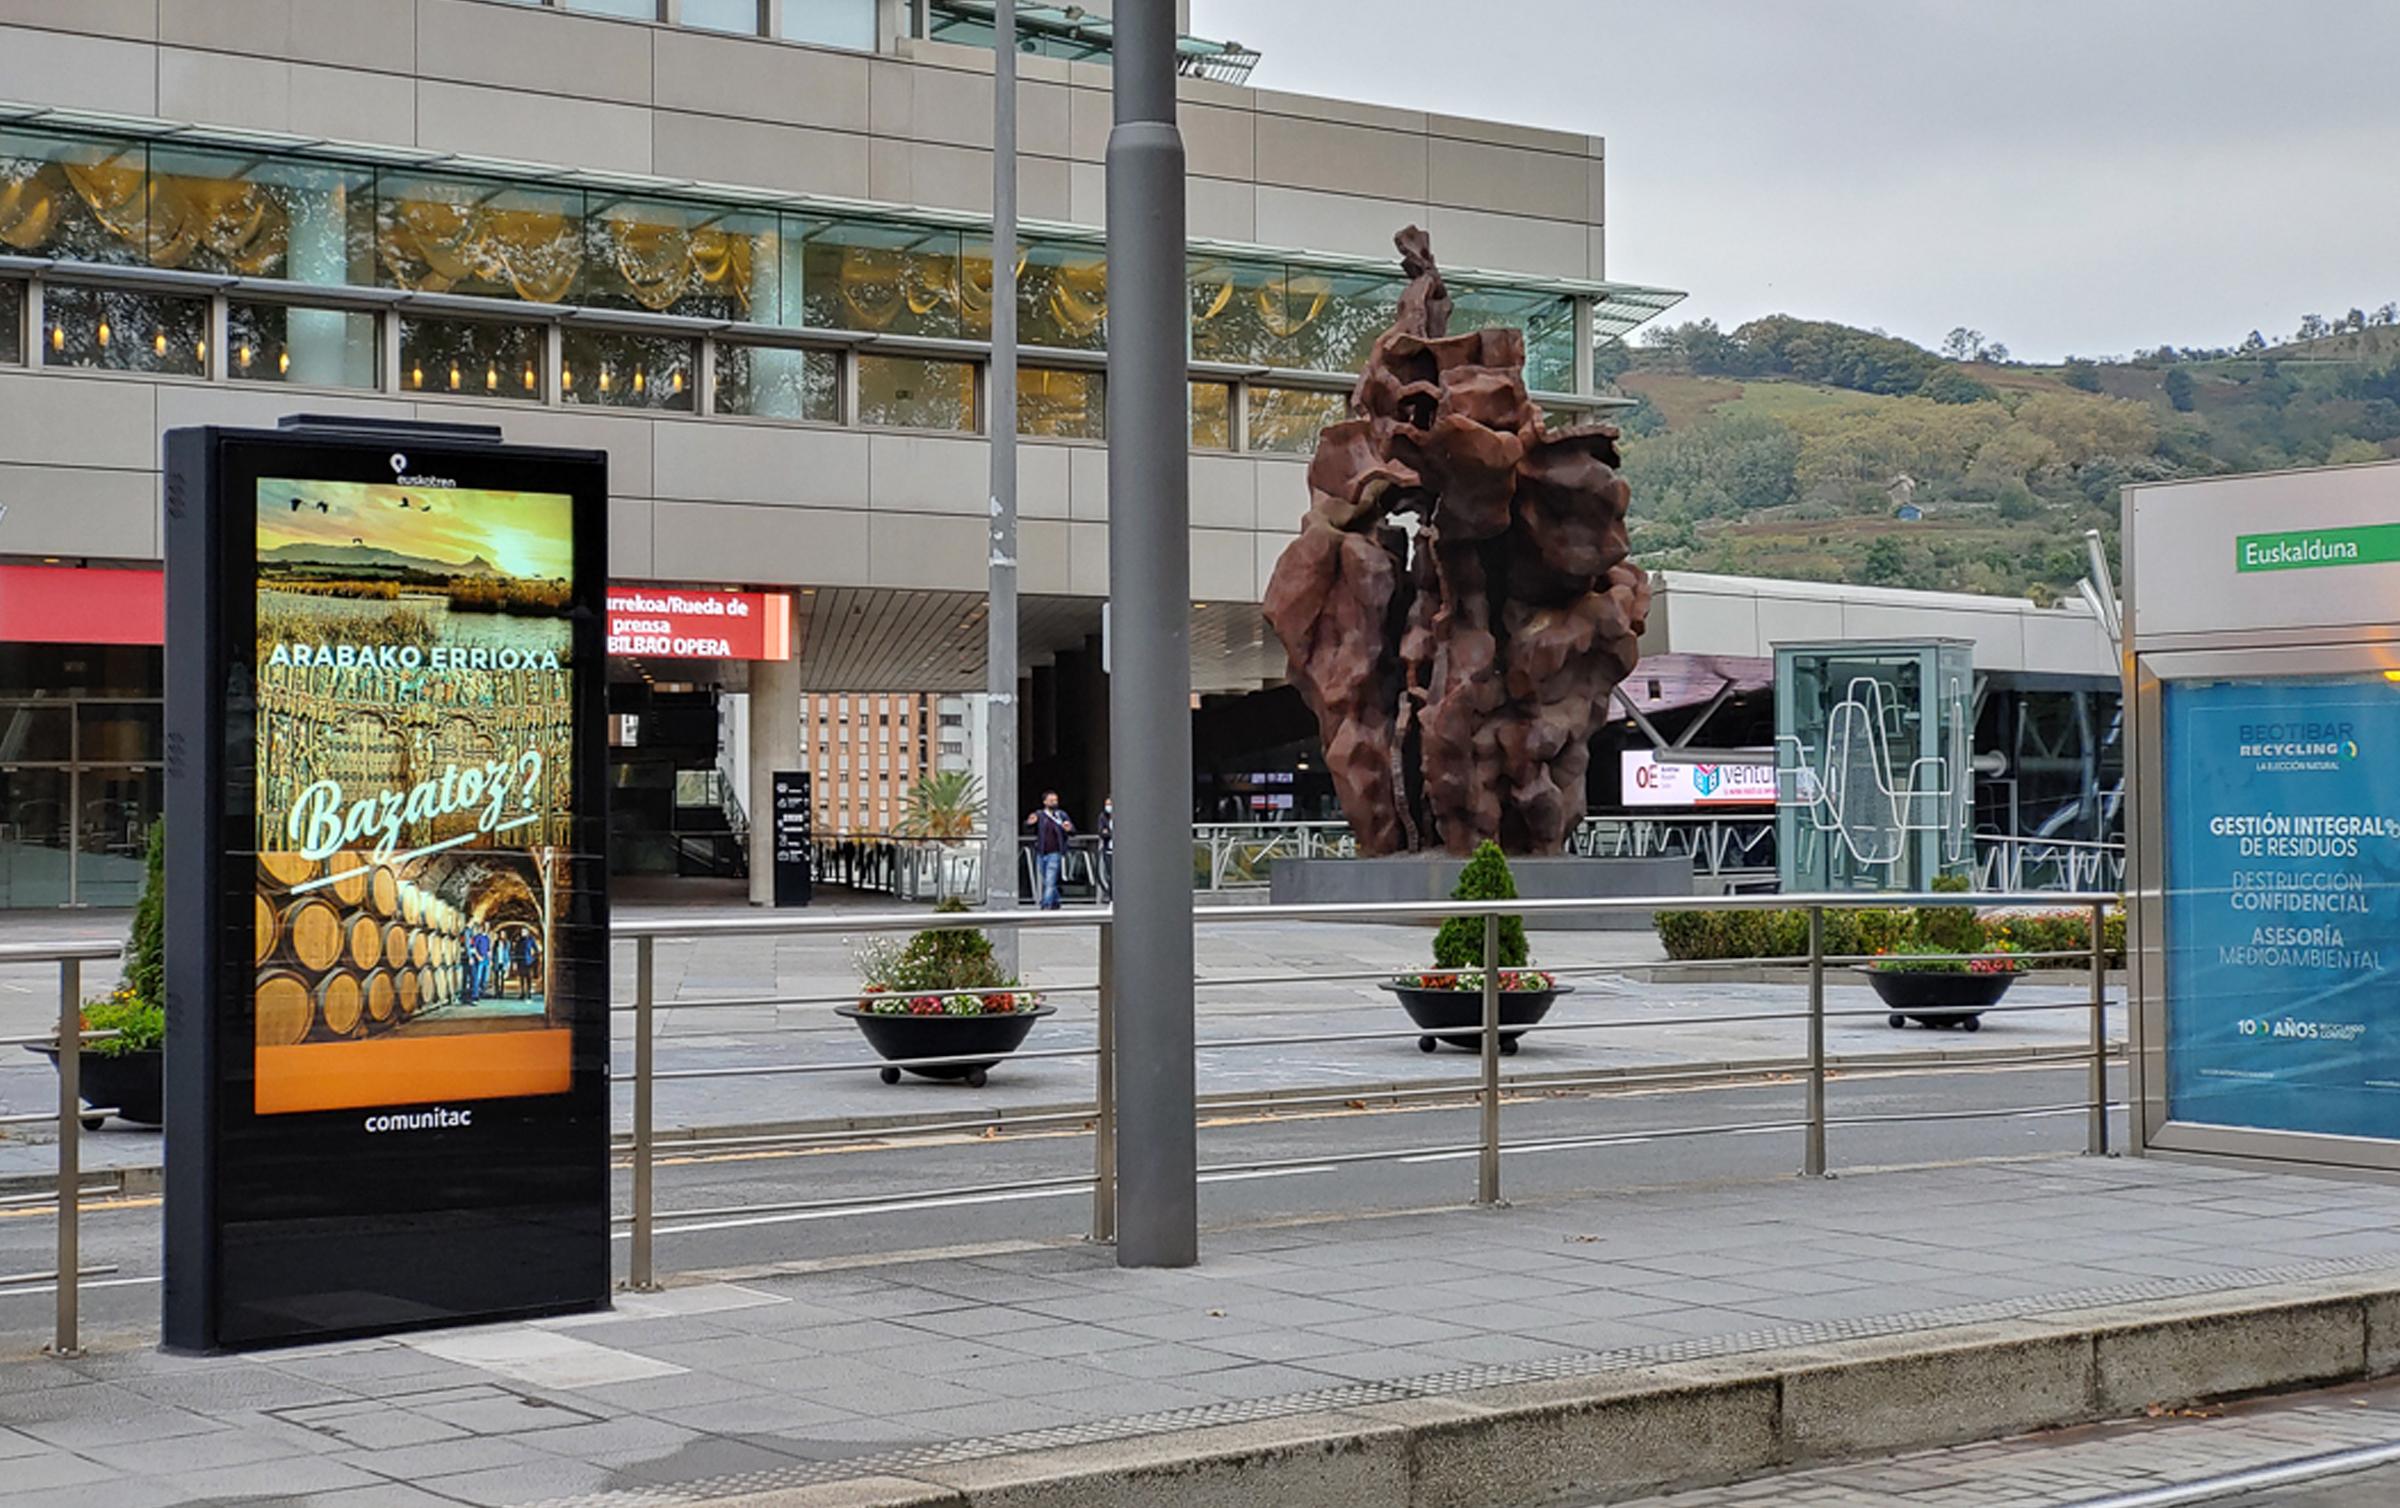 Cuadrilla de Rioja Alavesa – Campaña de promoción turística – Tranvía Bilbao